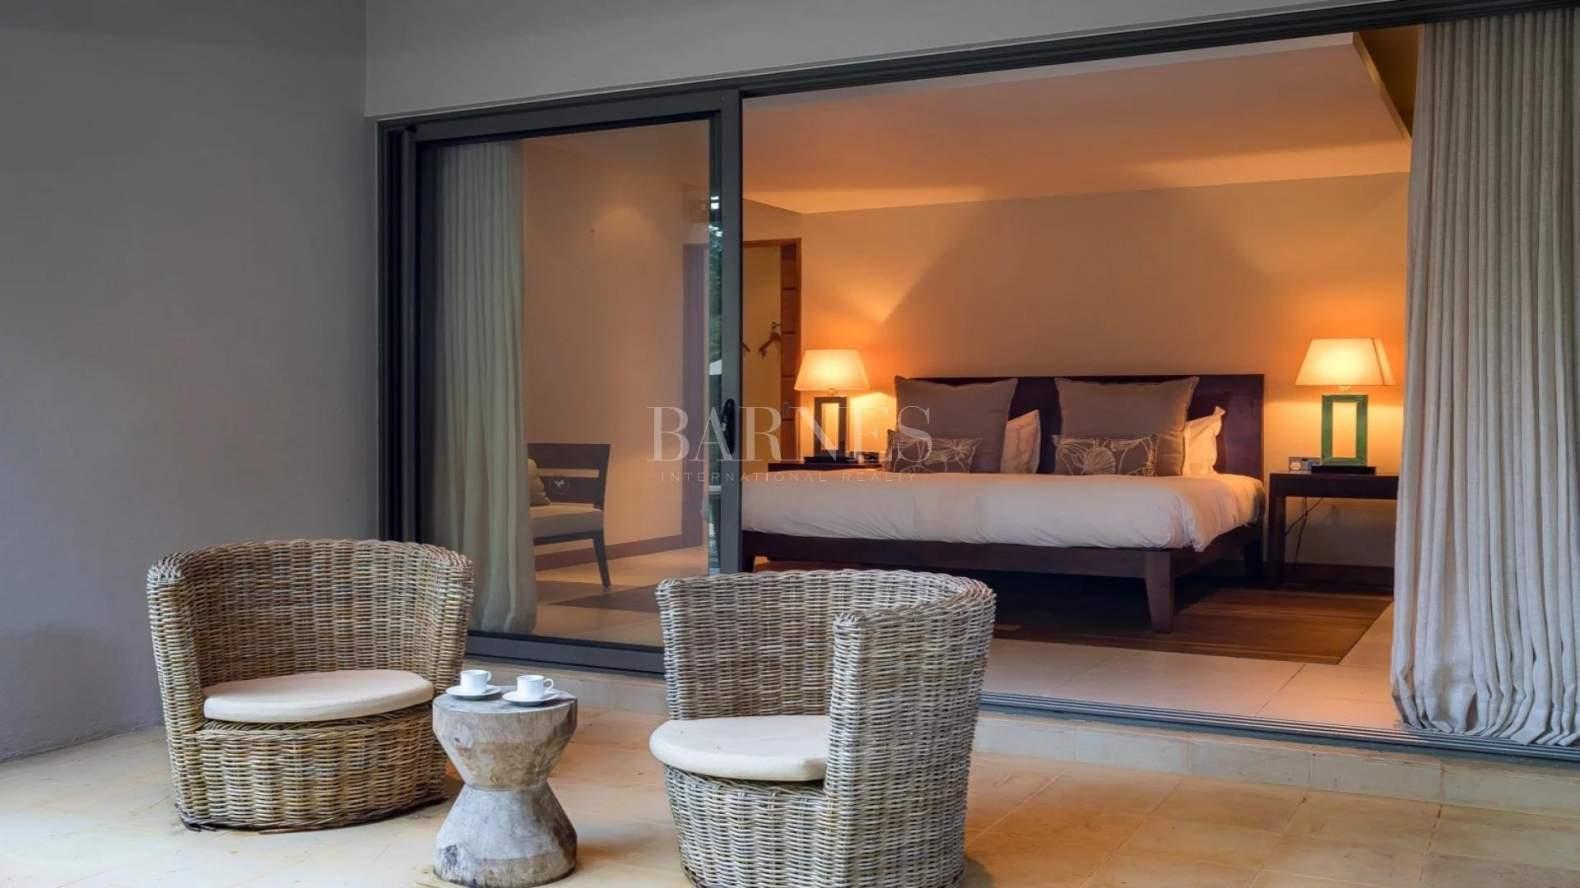 Beau Champ  - Villa 4 Bedrooms - picture 11